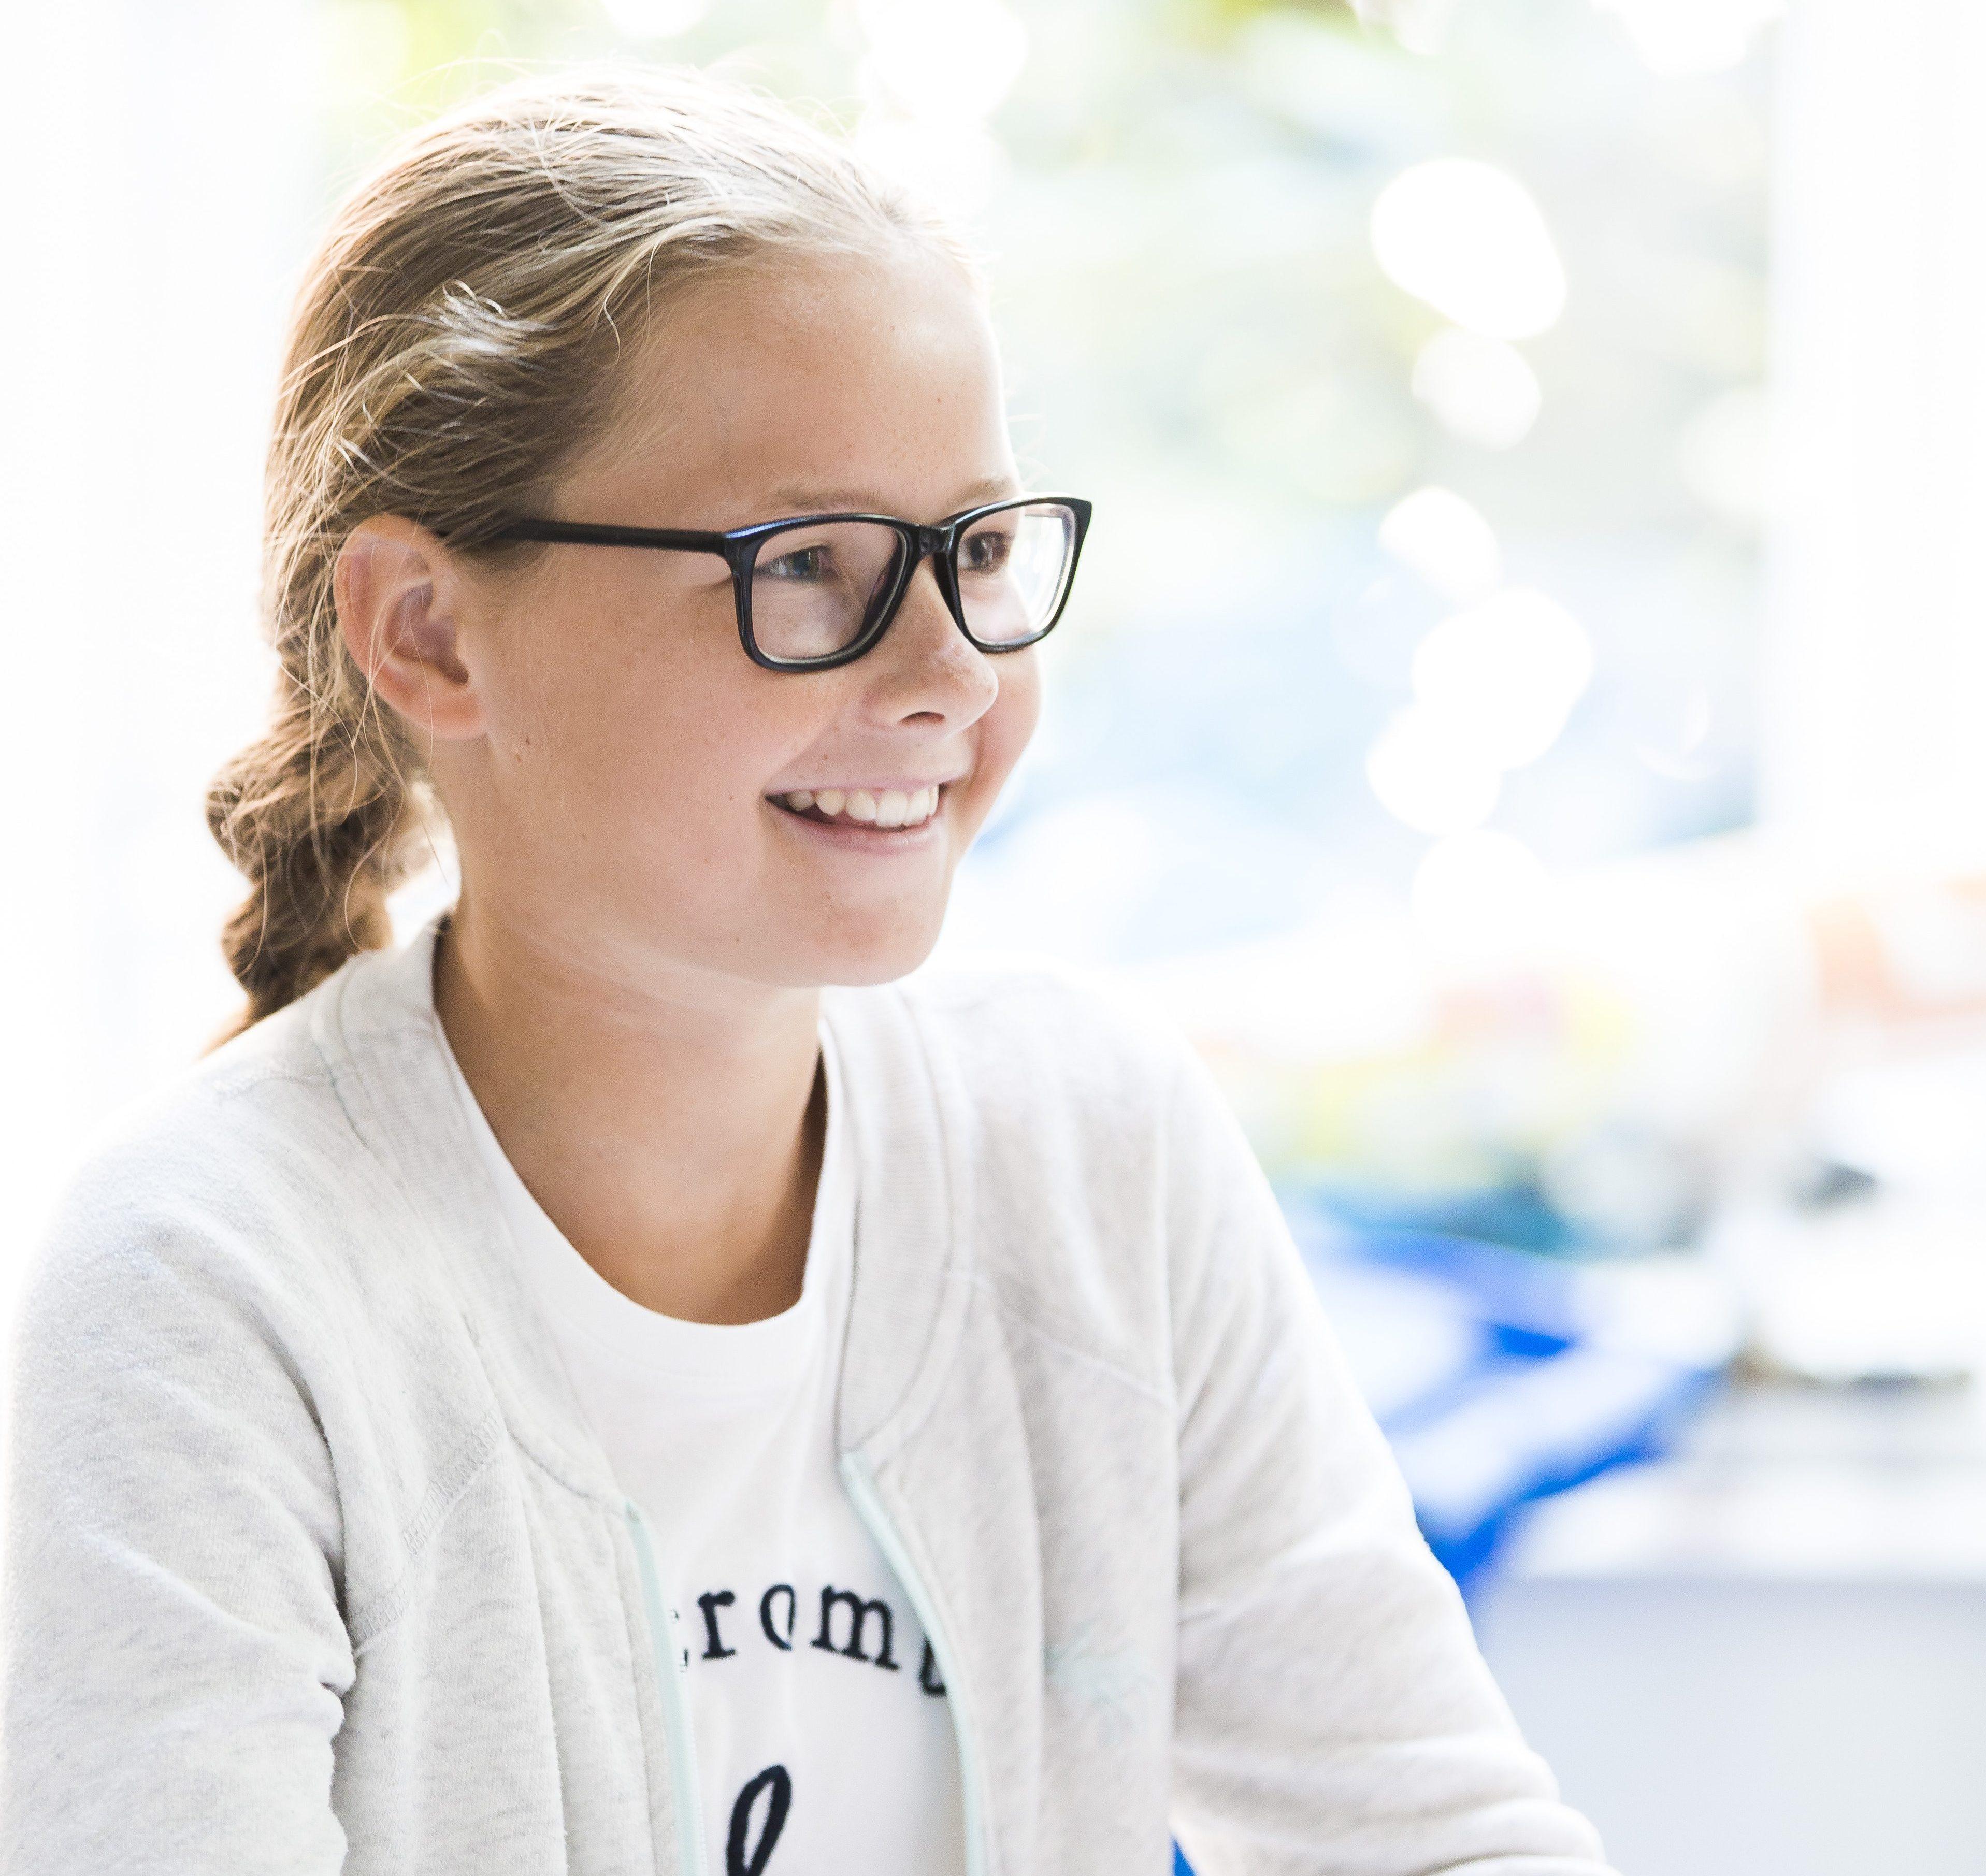 Haemstede-Barger-Mavo-HBM-middelbare-school-Heemstede-leerling-met-plezier-in-de-klas